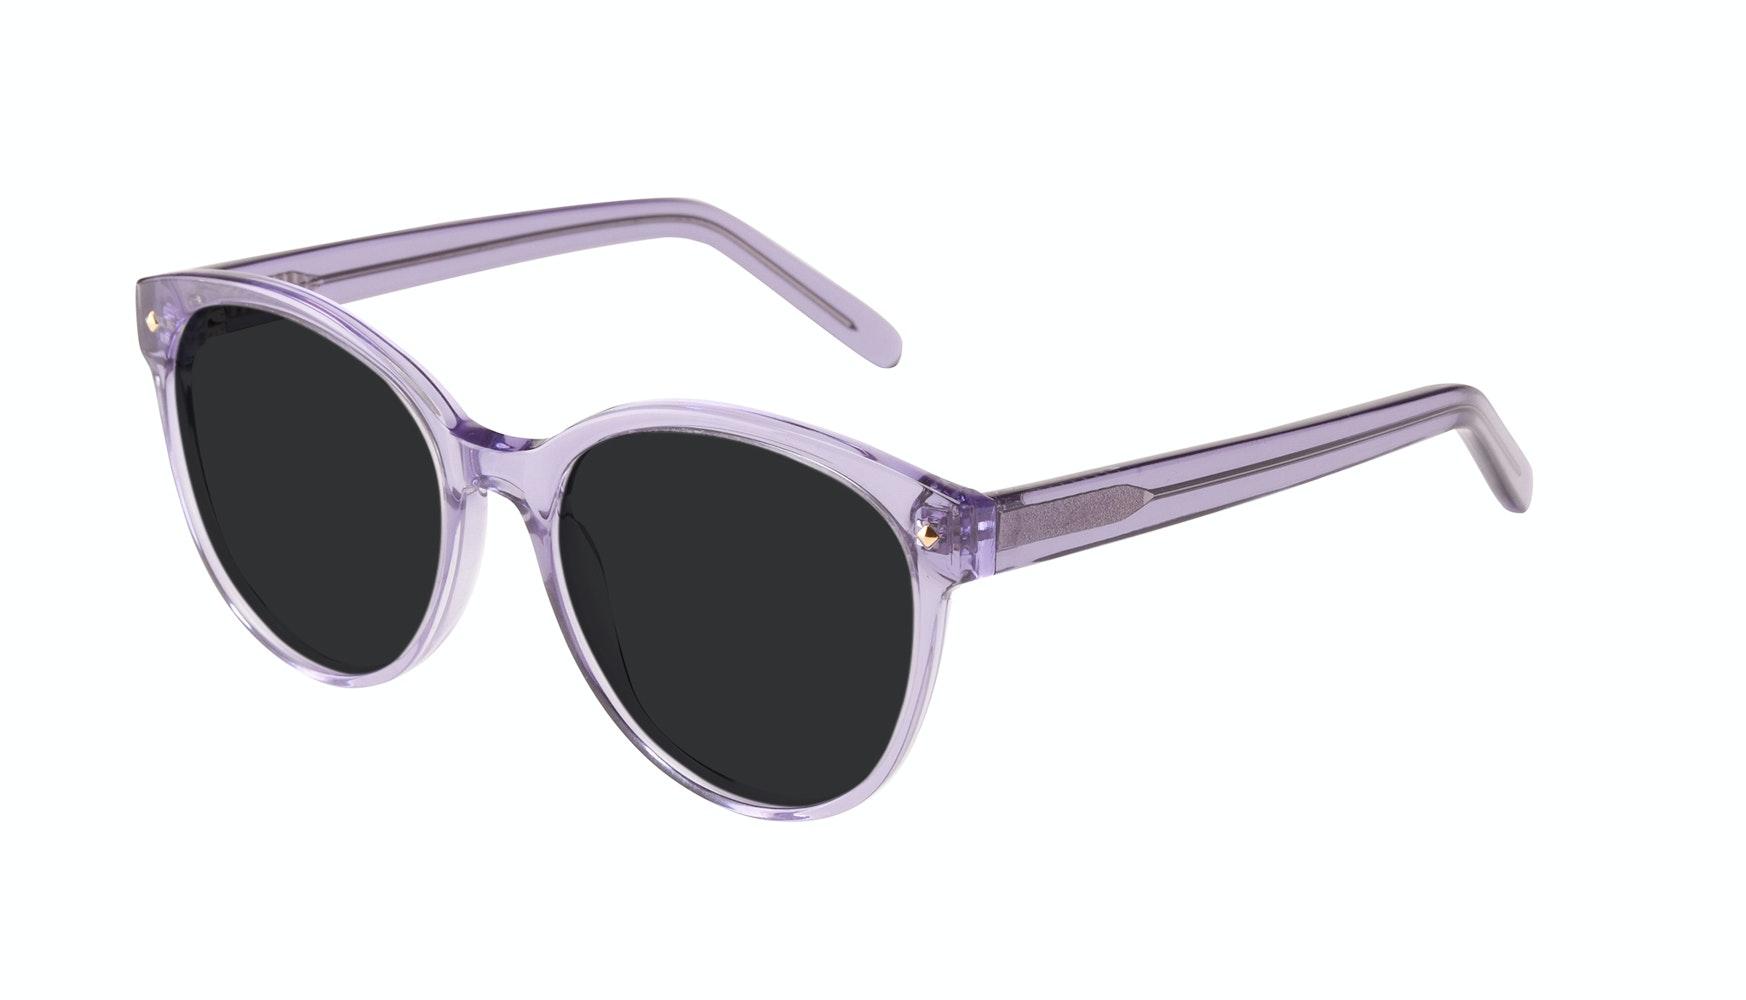 Affordable Fashion Glasses Round Sunglasses Women Eclipse Lavender Tilt